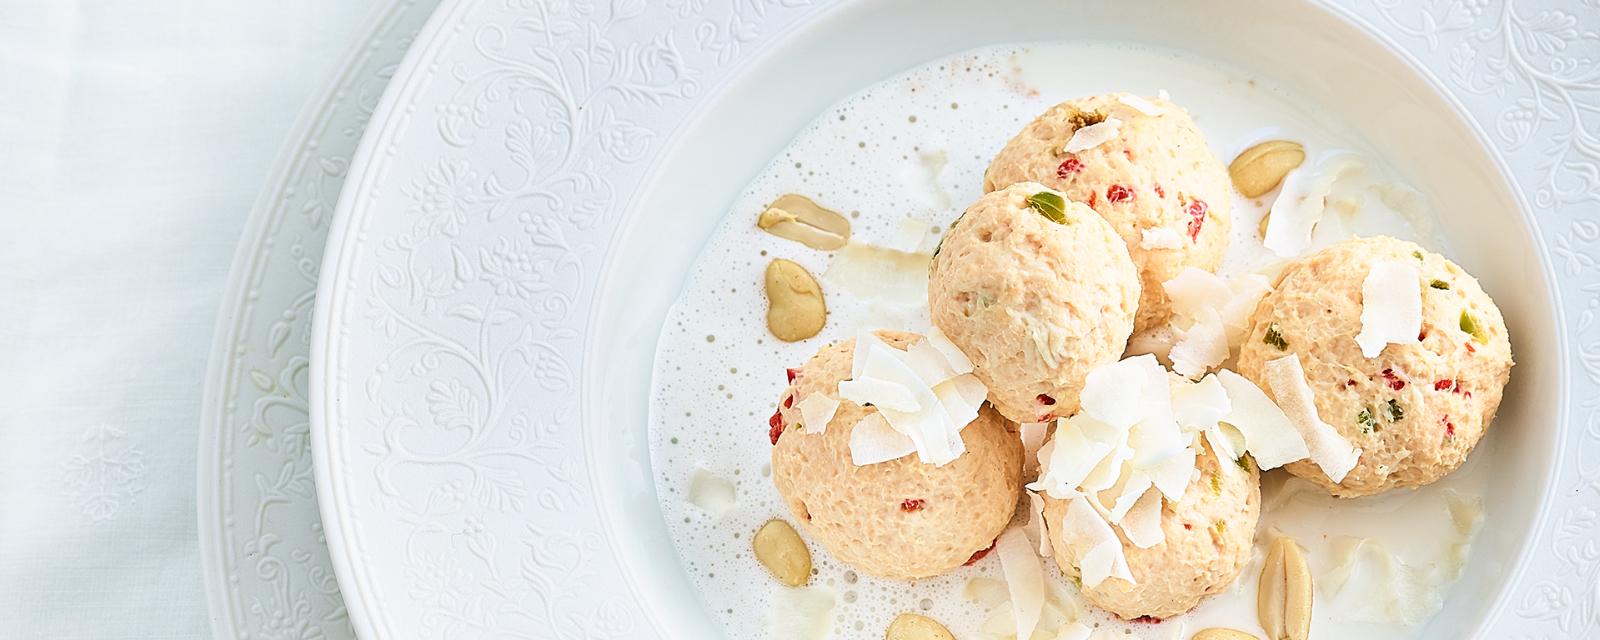 Vanilla ice cream with peanuts and coconut